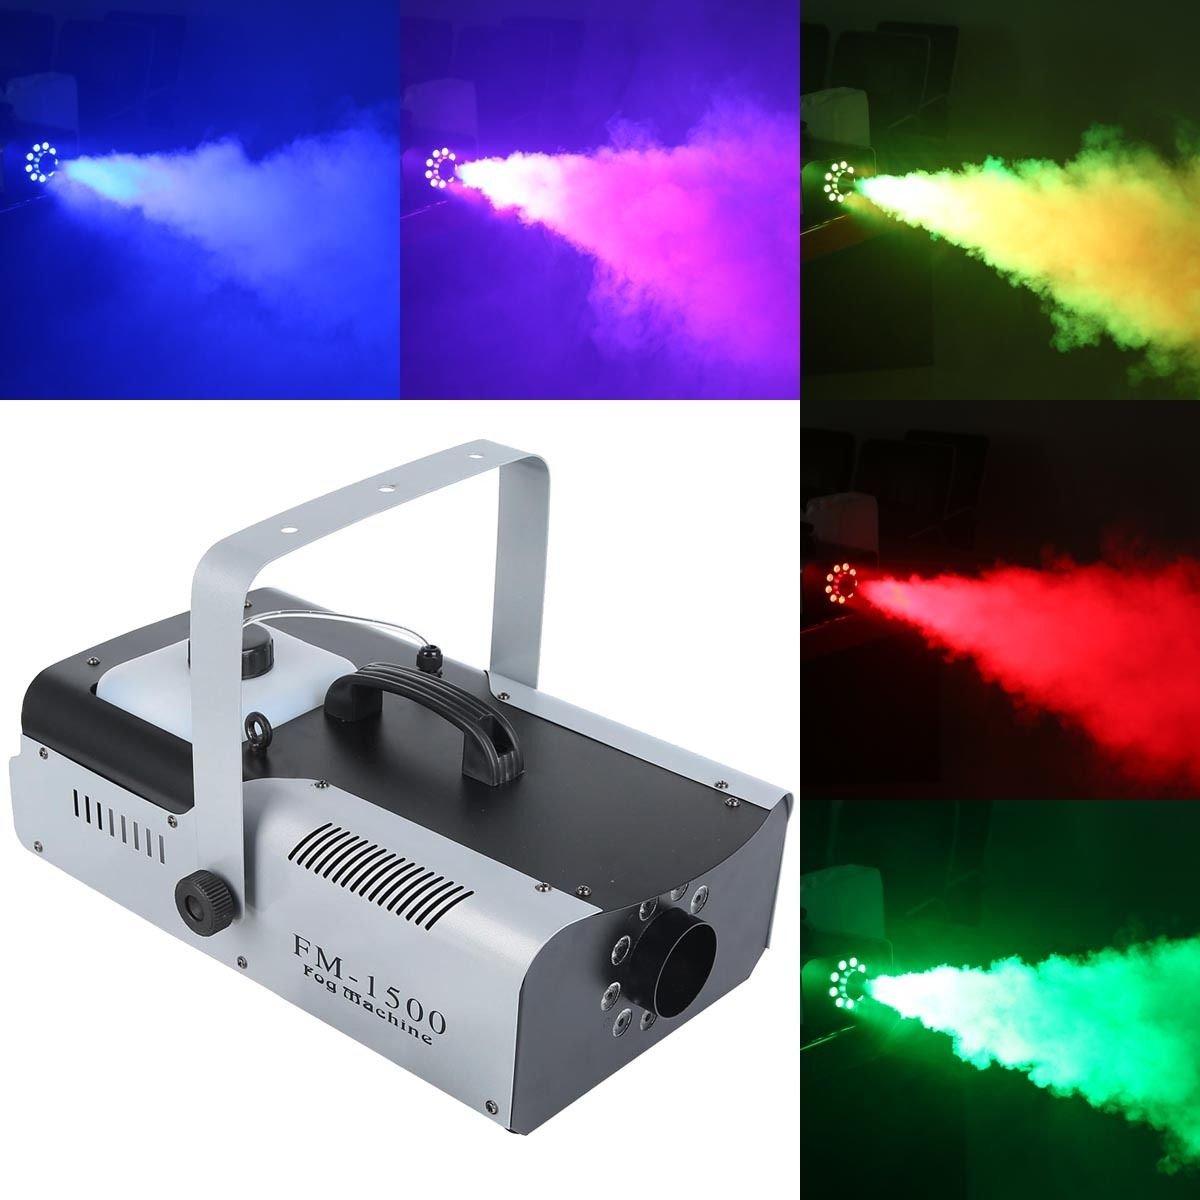 TC-Home 1500 Watt Smoke Fog Machine 9 LED Lights Remote Control DJ Party Stage Fogger by TC-Home